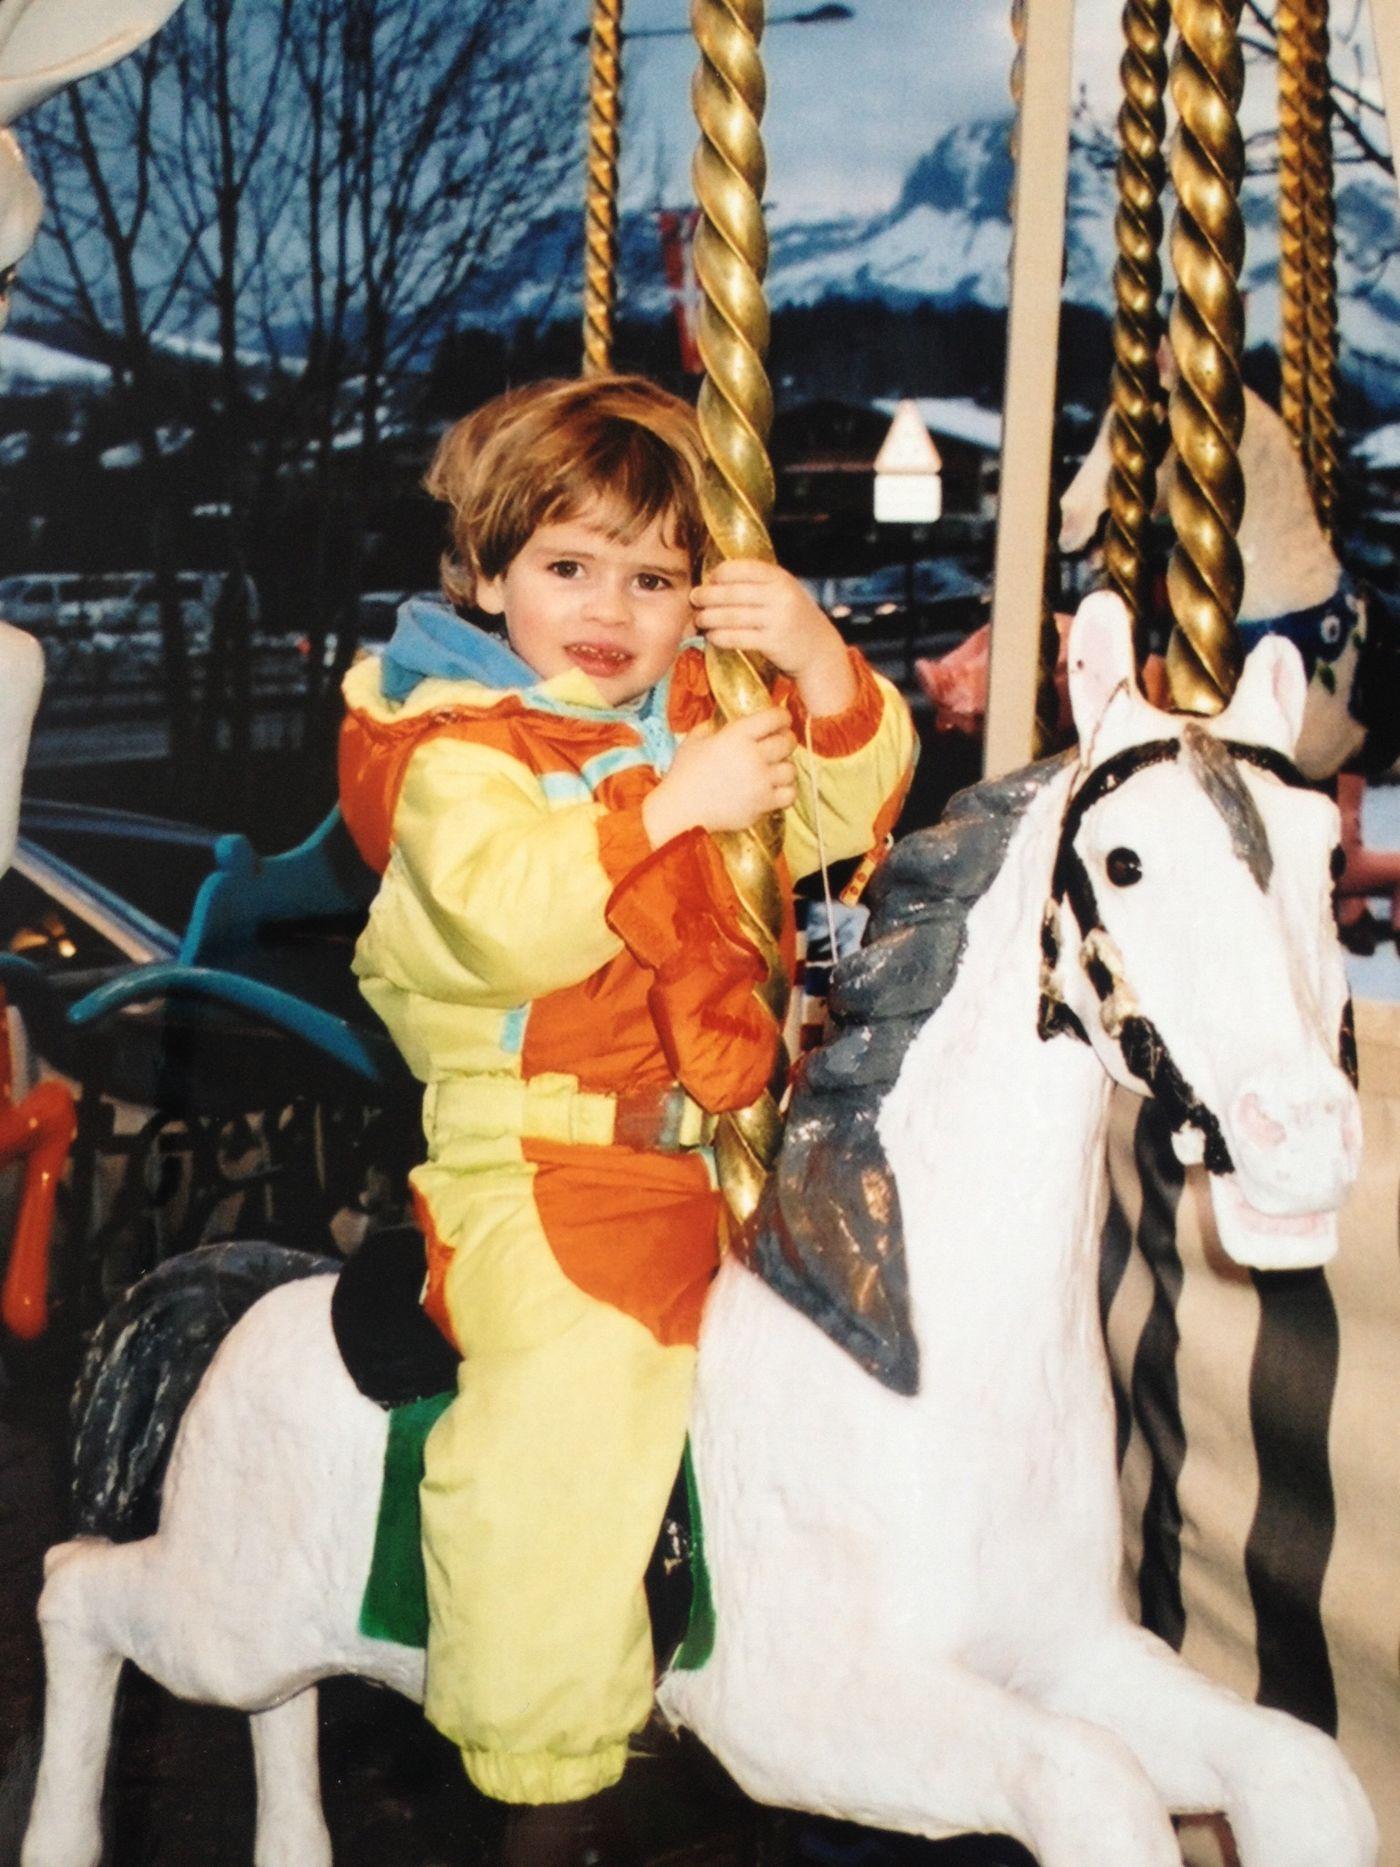 Souvenir D'enfance 👶🏼 First Eyeem Photo